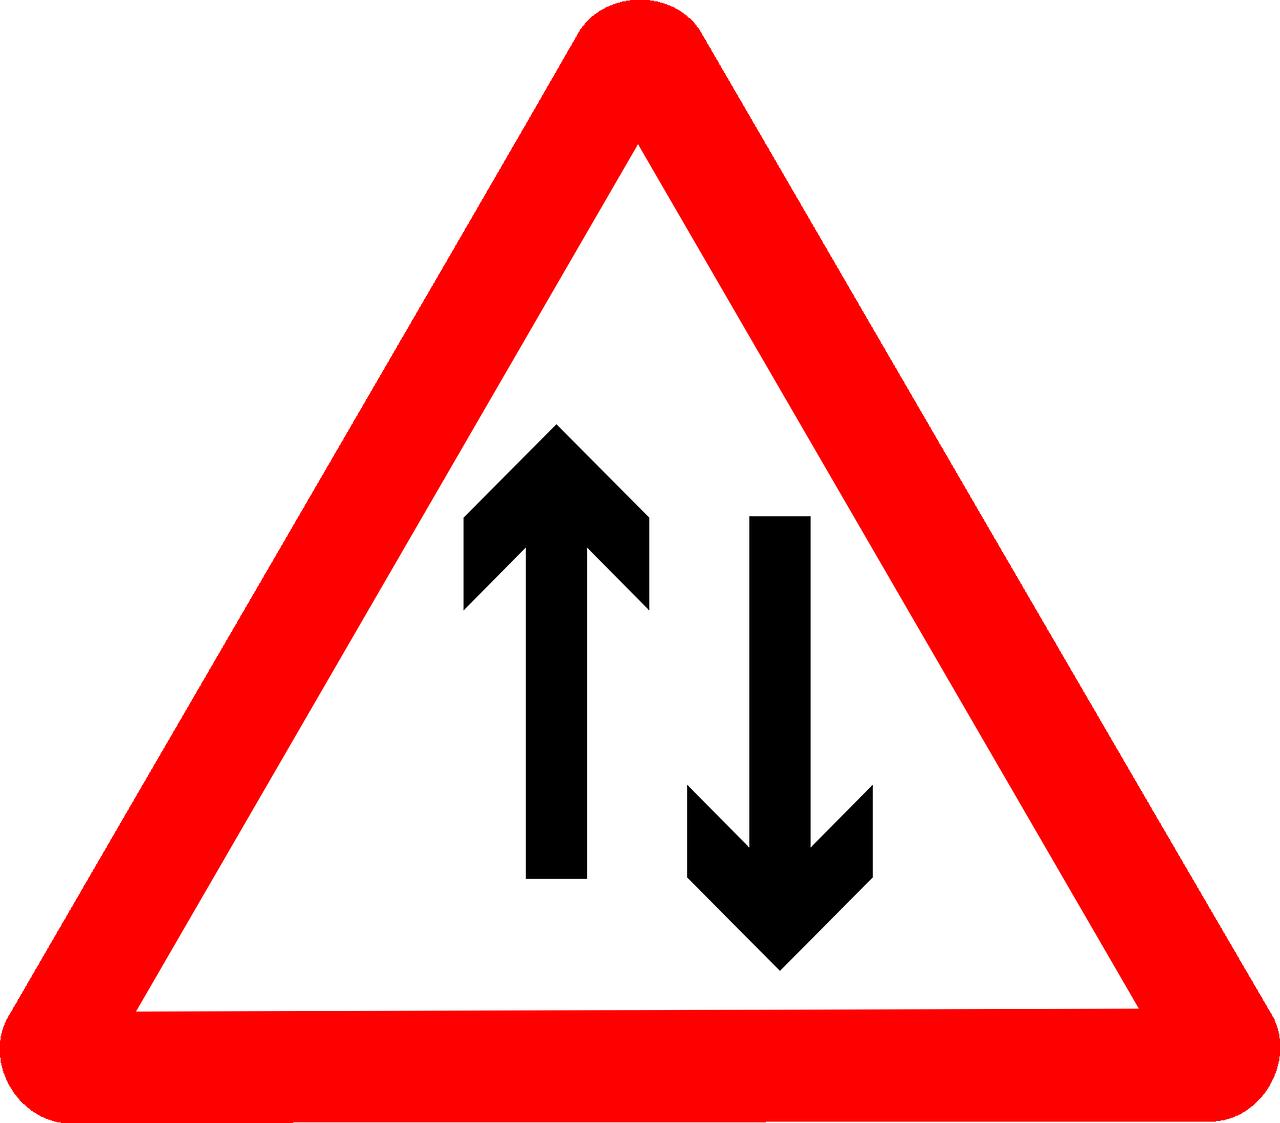 Future clipart future ahead. Travel sign traffic two